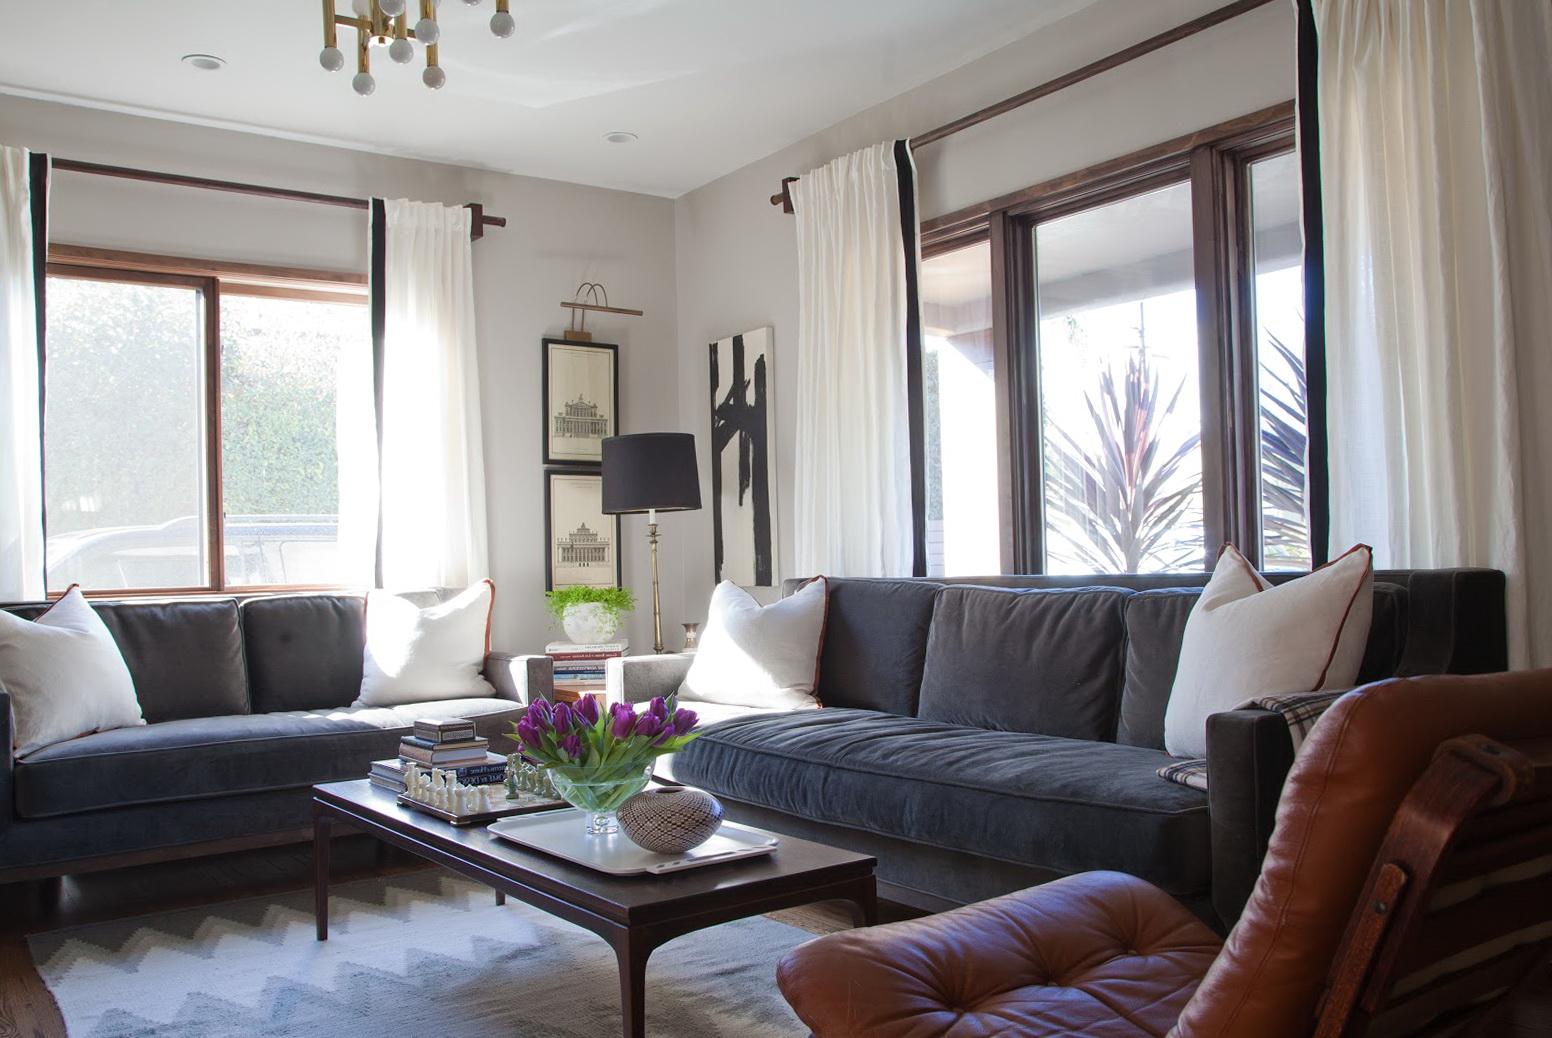 Ikea aina linen curtains home design ideas for Linen curtains ikea